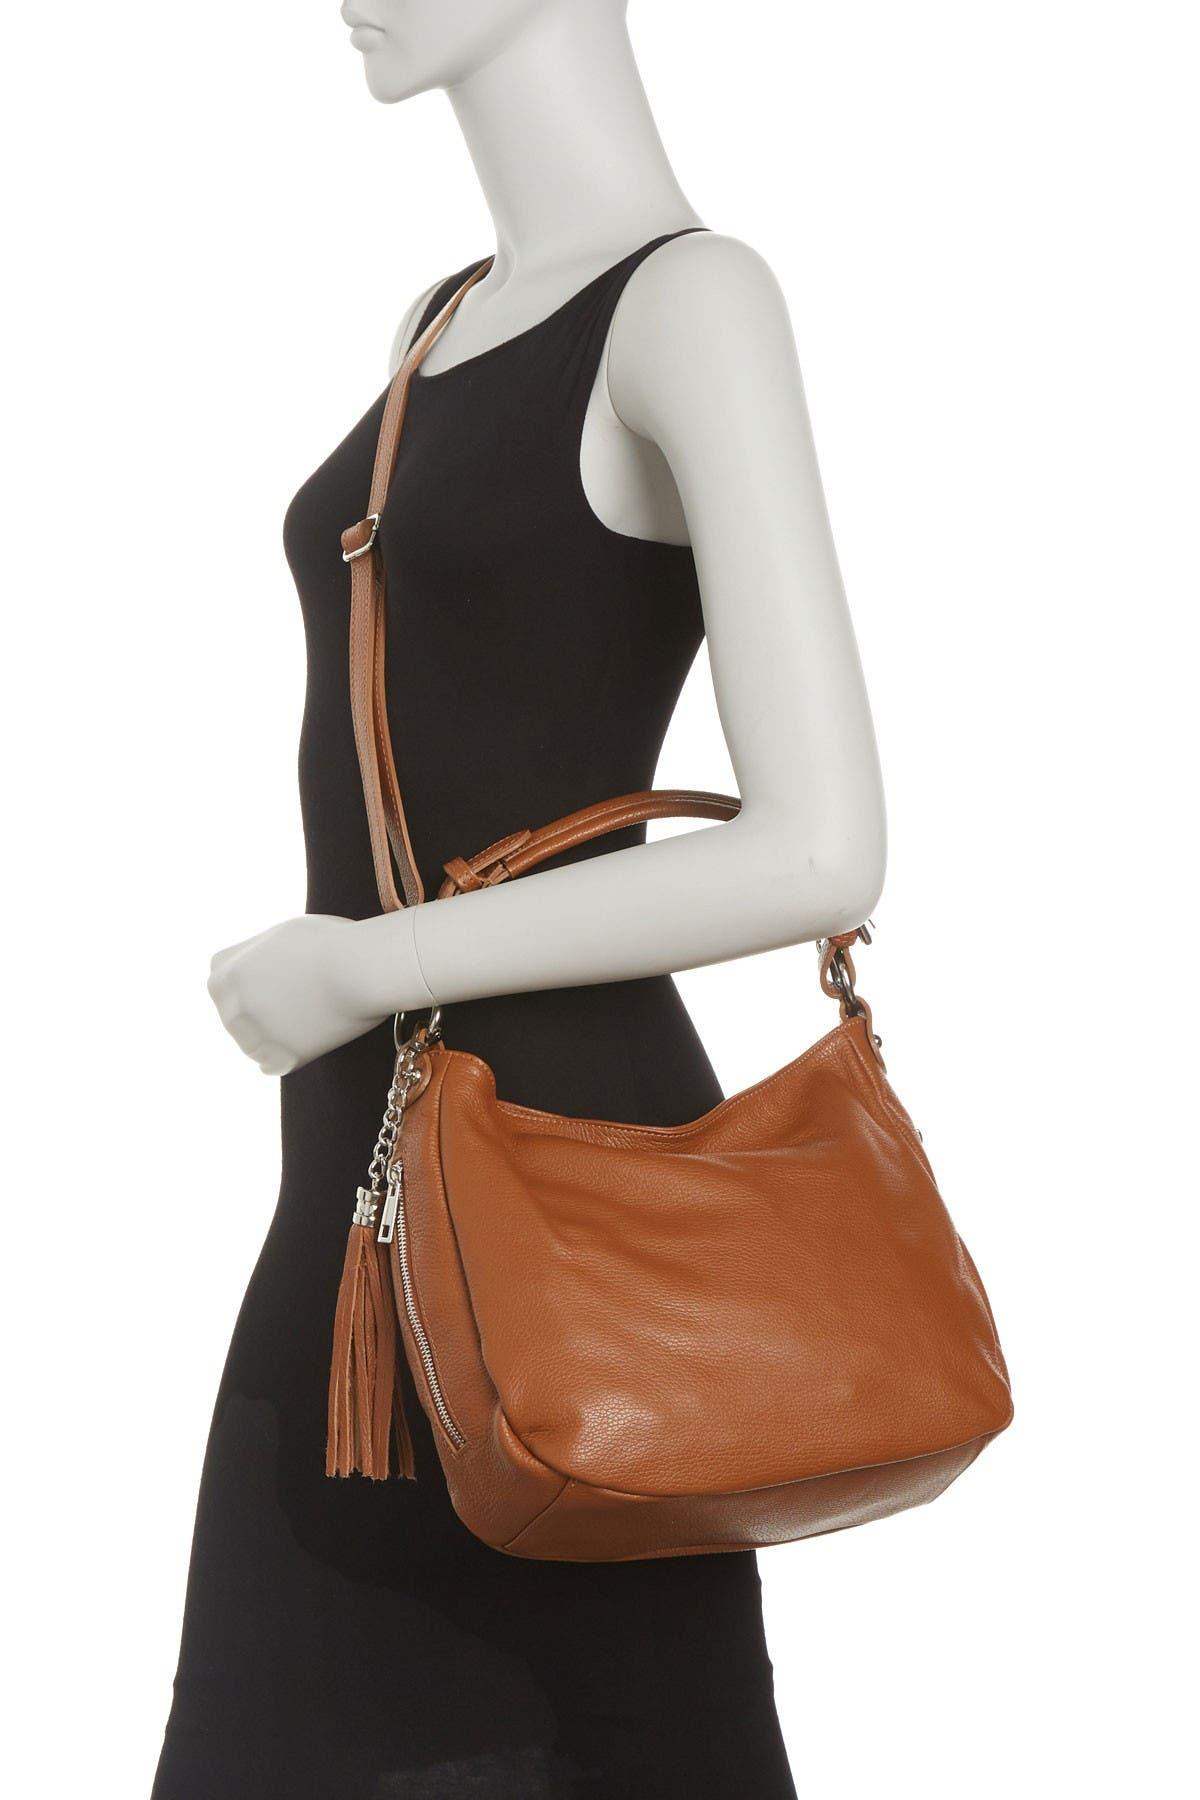 Image of Anna Luchini Pebbled Leather Hobo Bag